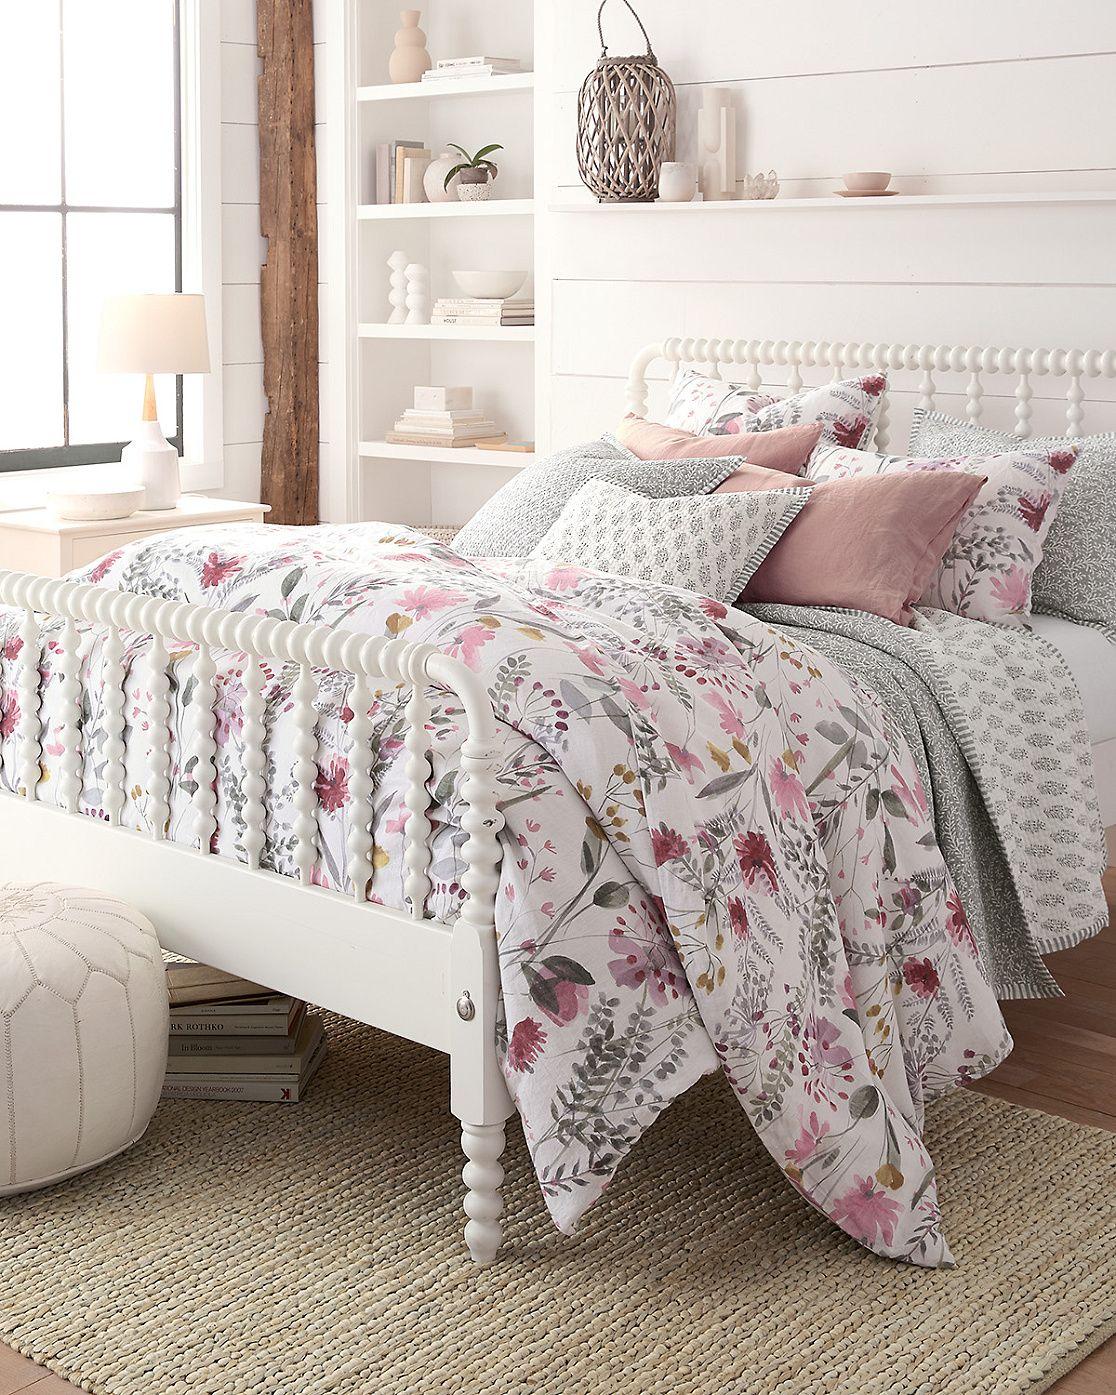 Wildflower Linen Duvet Cover, Sham, and Pillow Cover